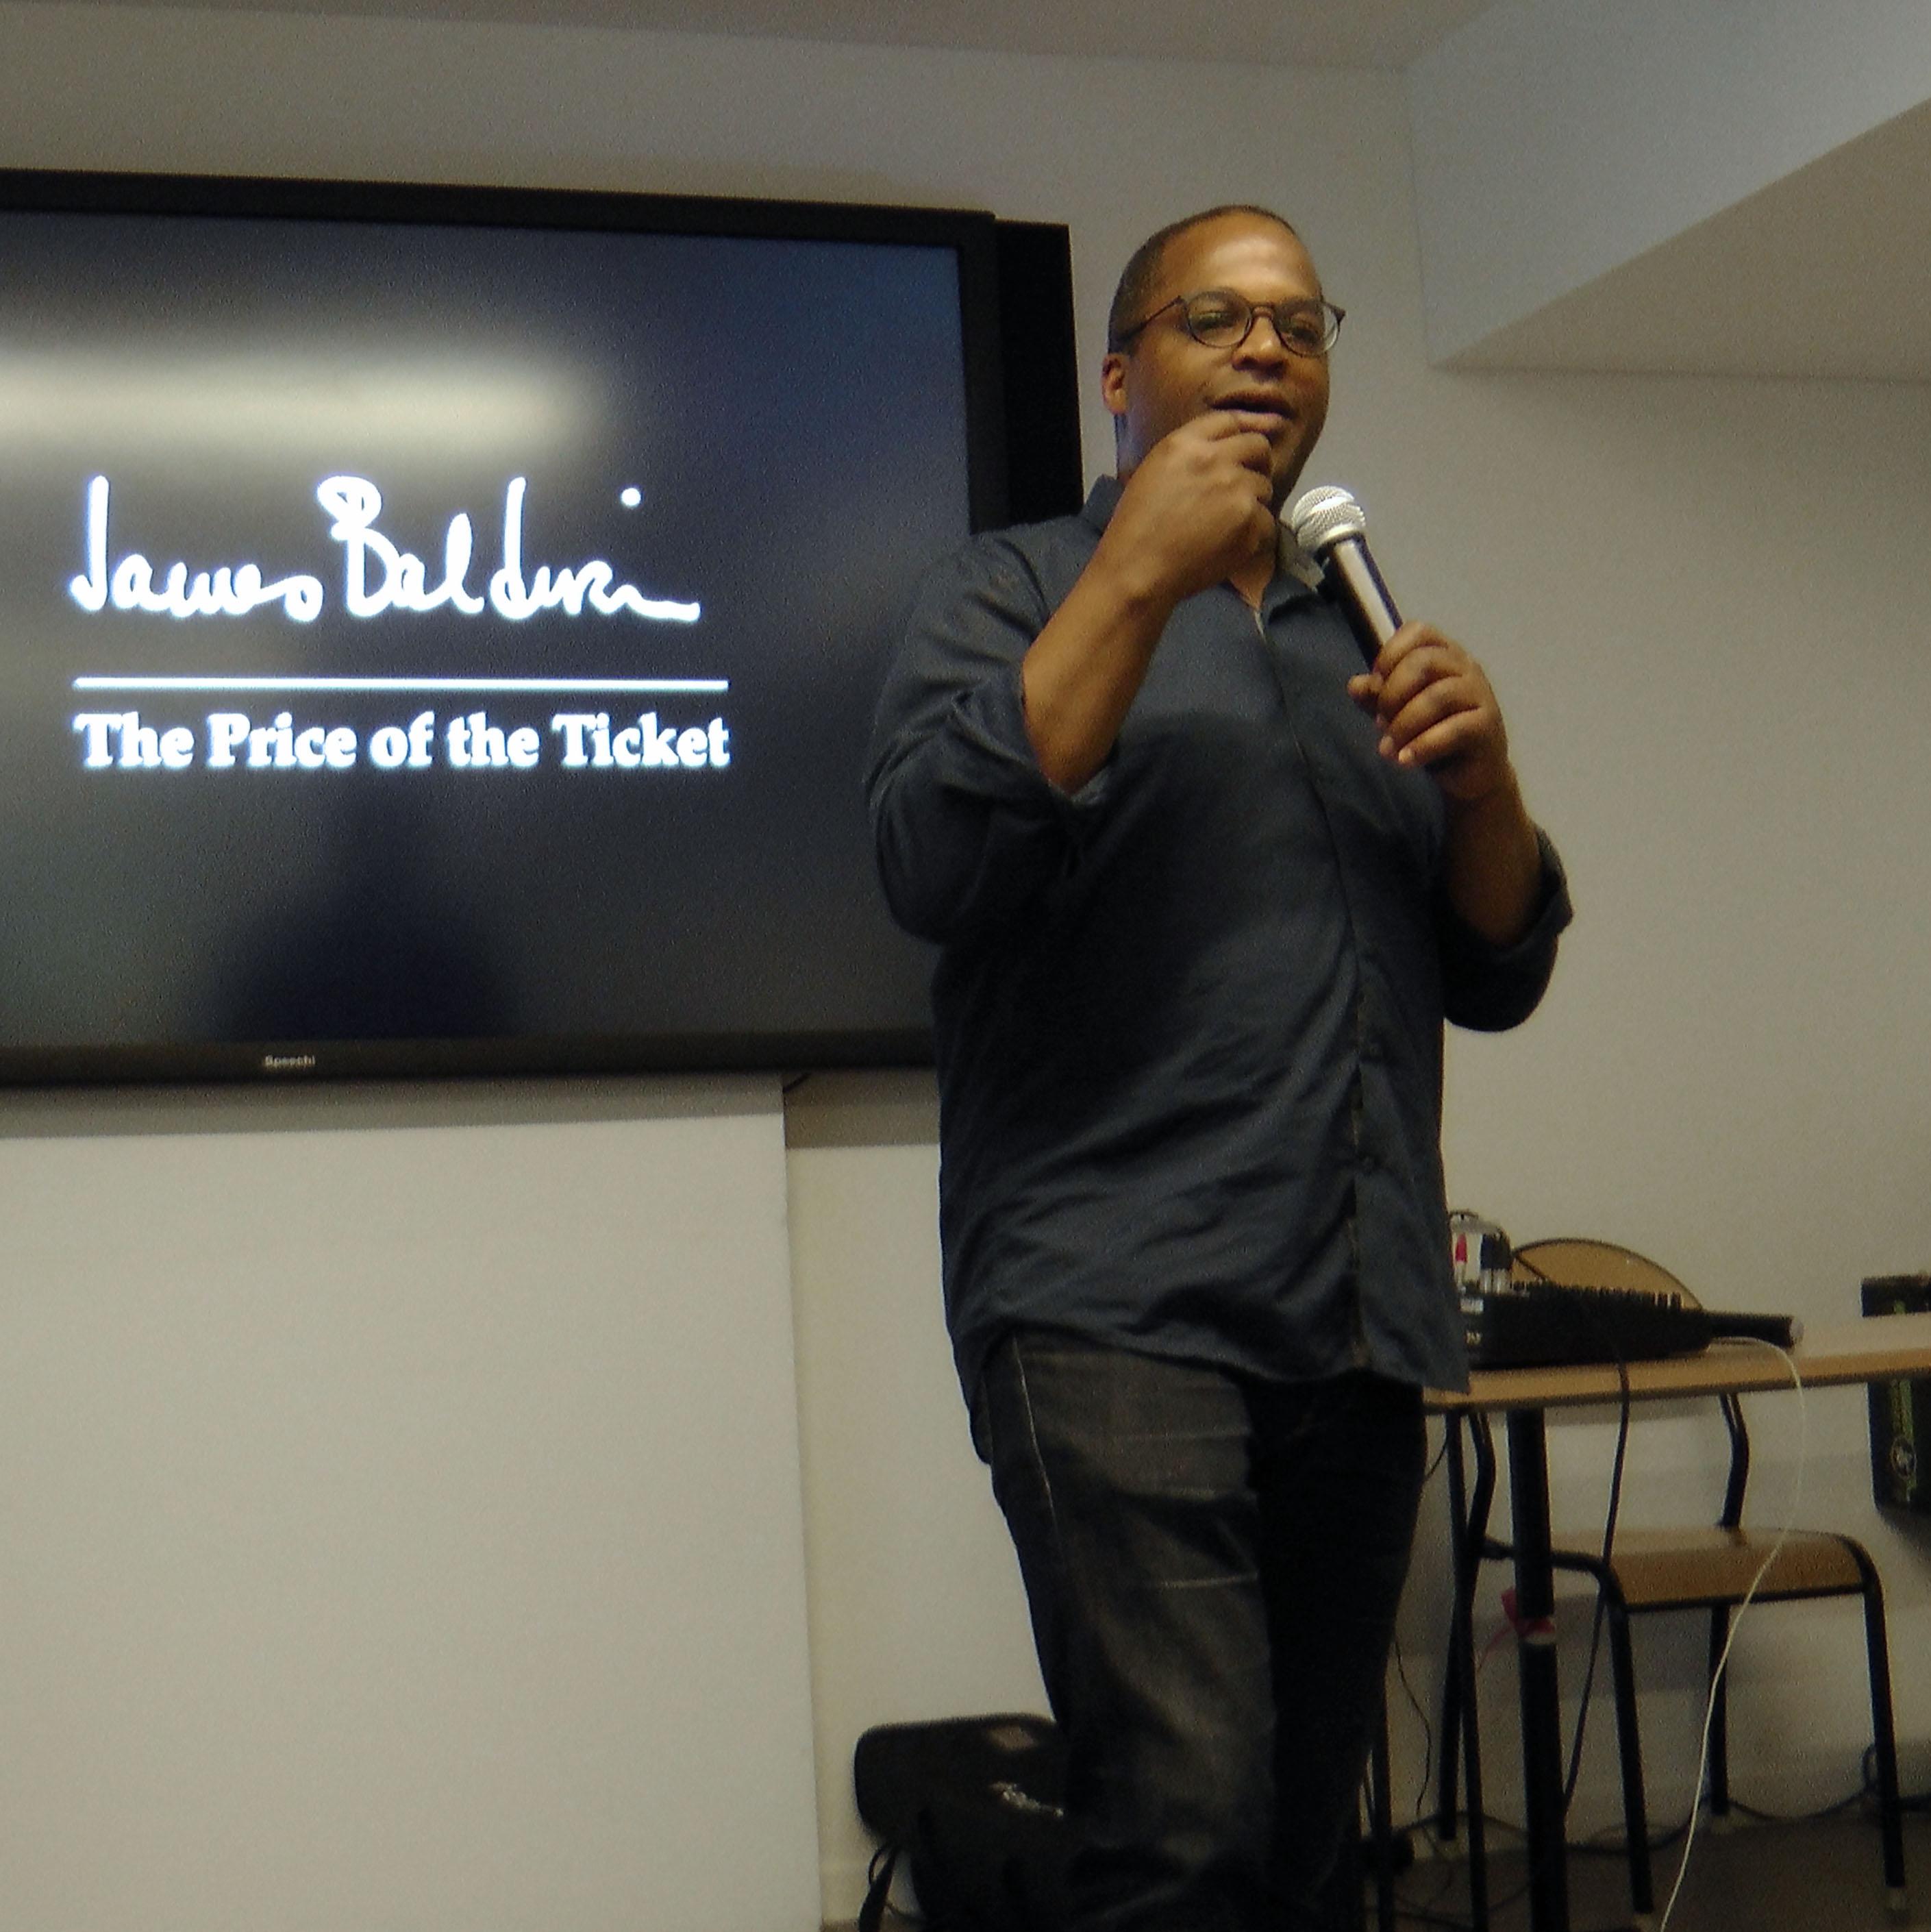 James baldwin price of the ticket essay writer